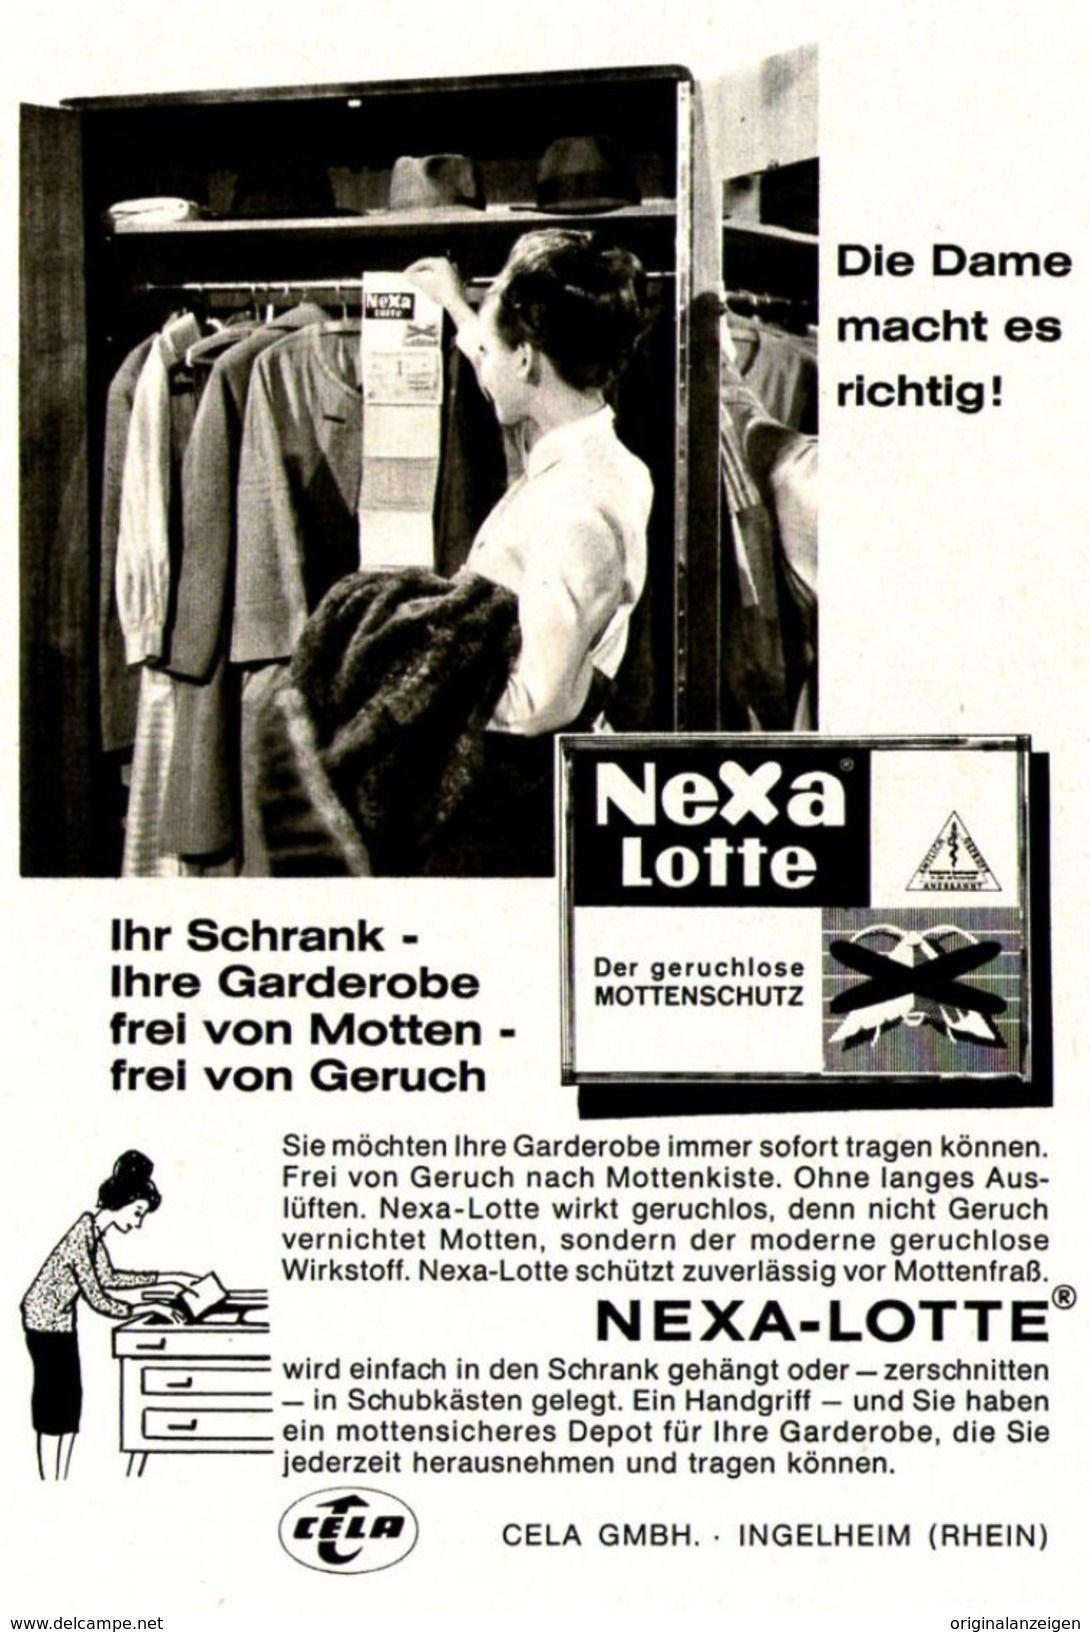 Original Werbung Anzeige 1964 Nexa Lotte Gegen Motten Ca 120 X 170 Mm Werbung Werbung Zu Verkaufen Mottenschutz